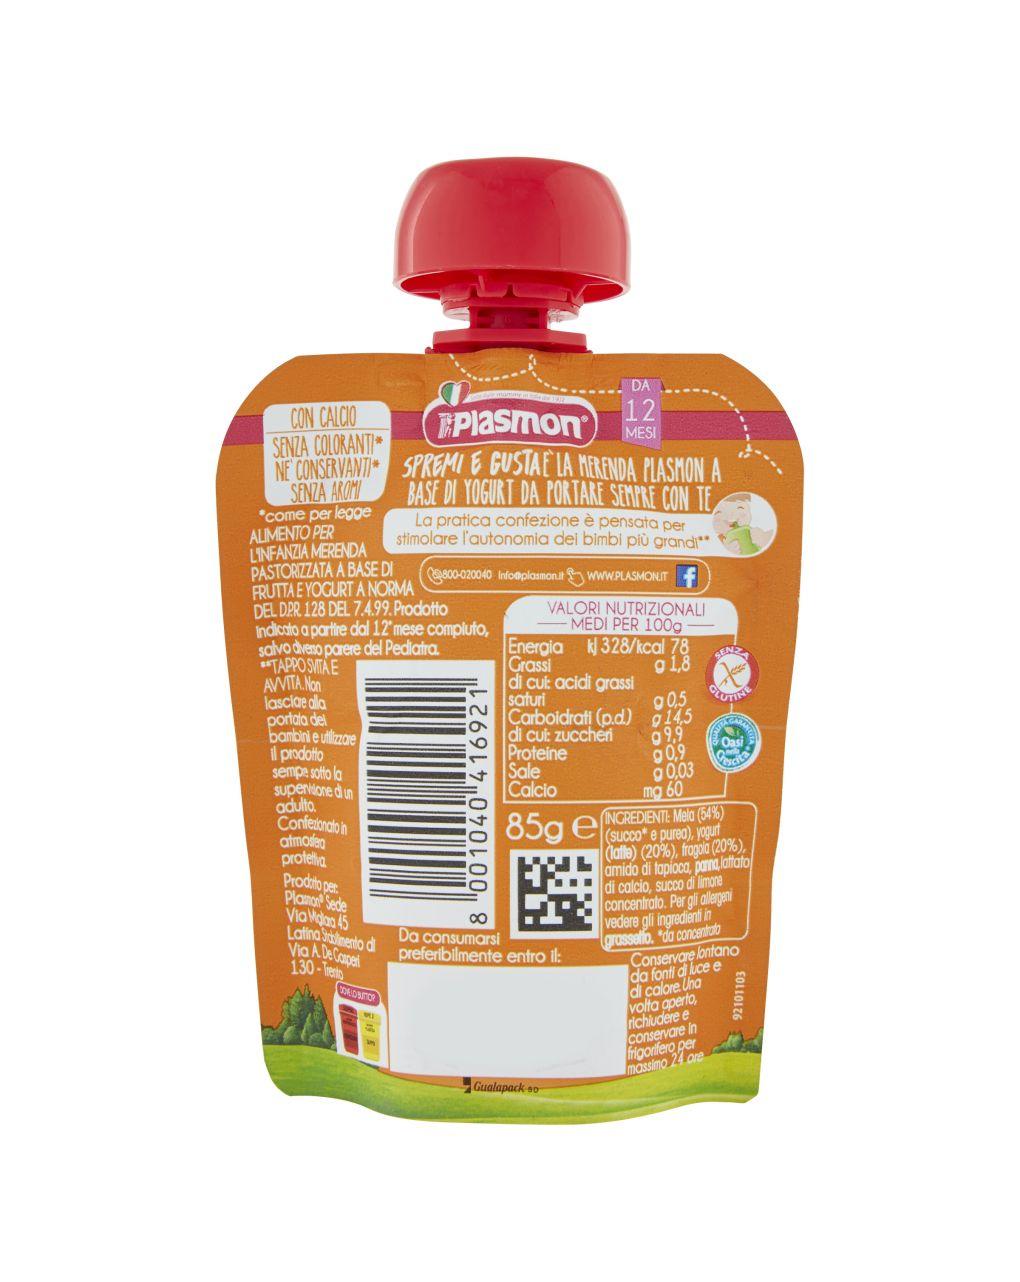 Plasmon - spremi e gusta dessert fragola, mela e yogurt 85g - Plasmon